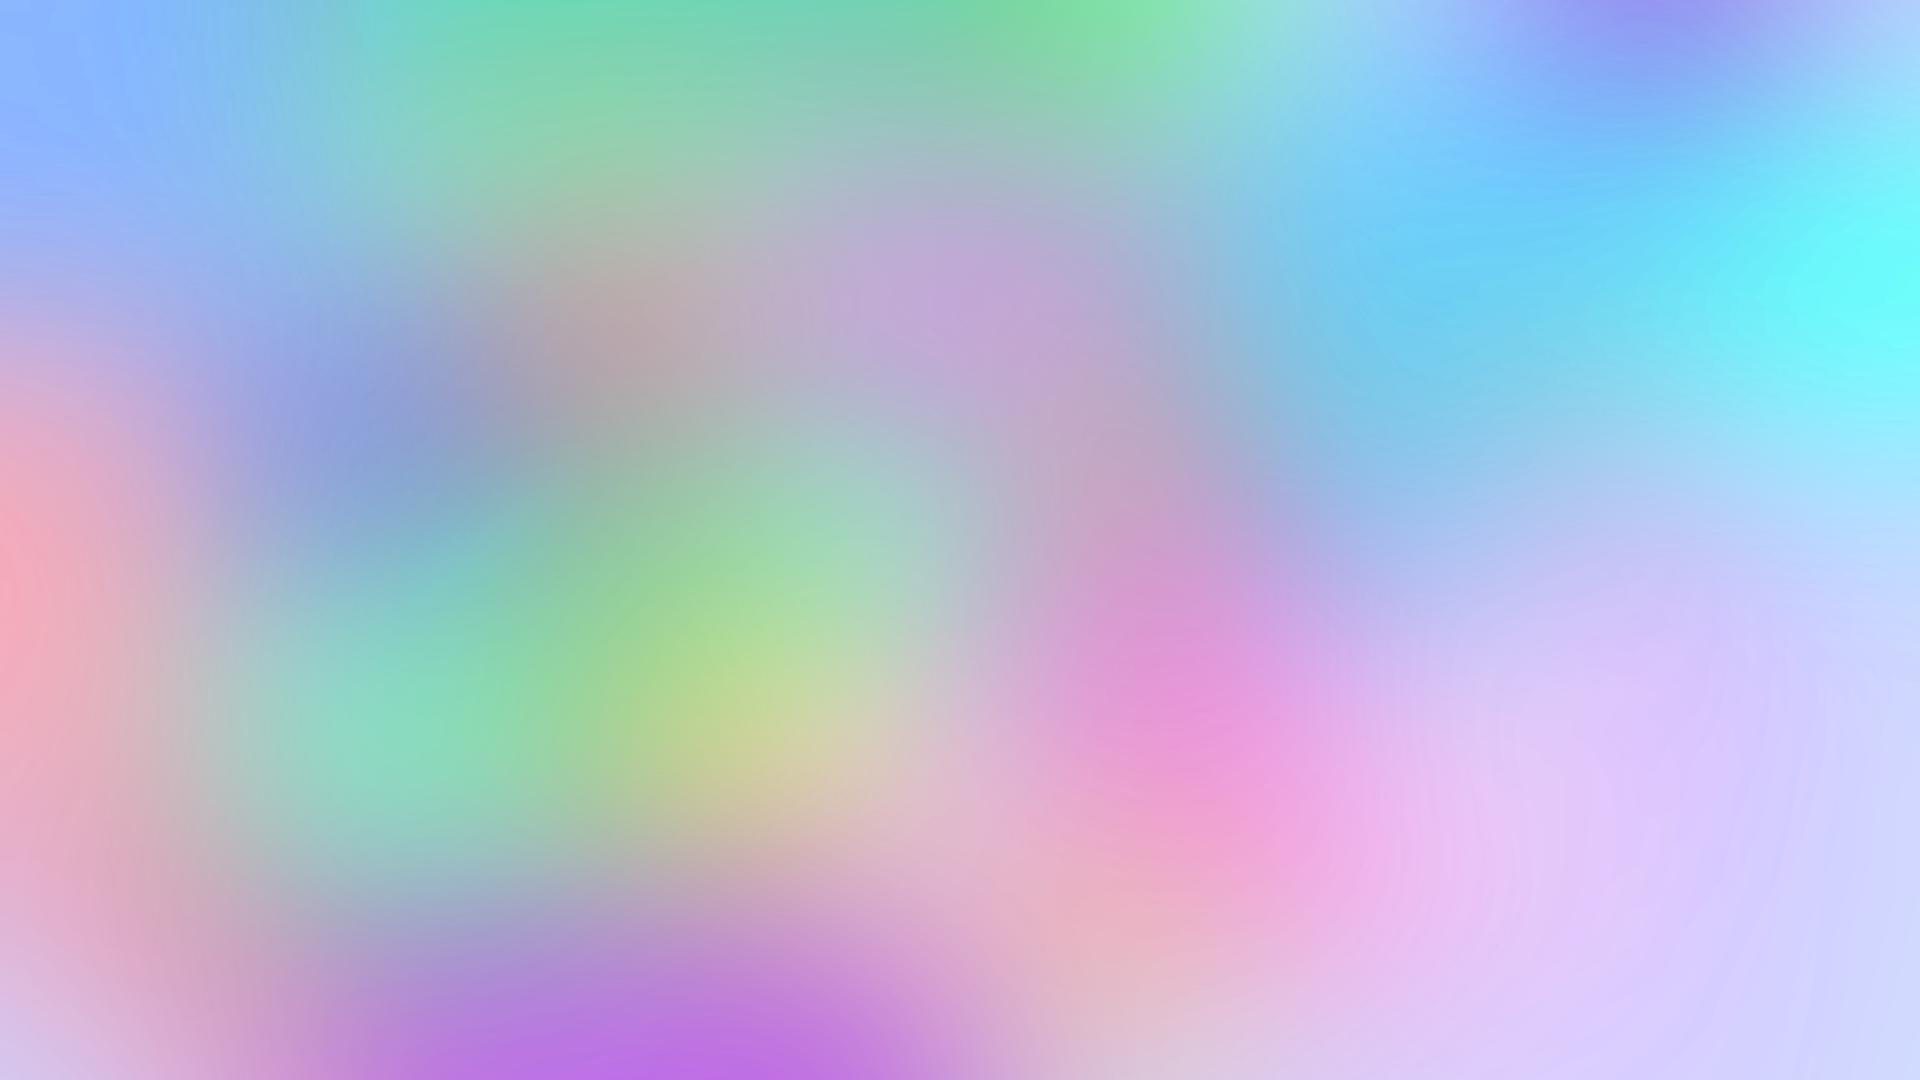 74 Pastel Backgrounds On Wallpapersafari